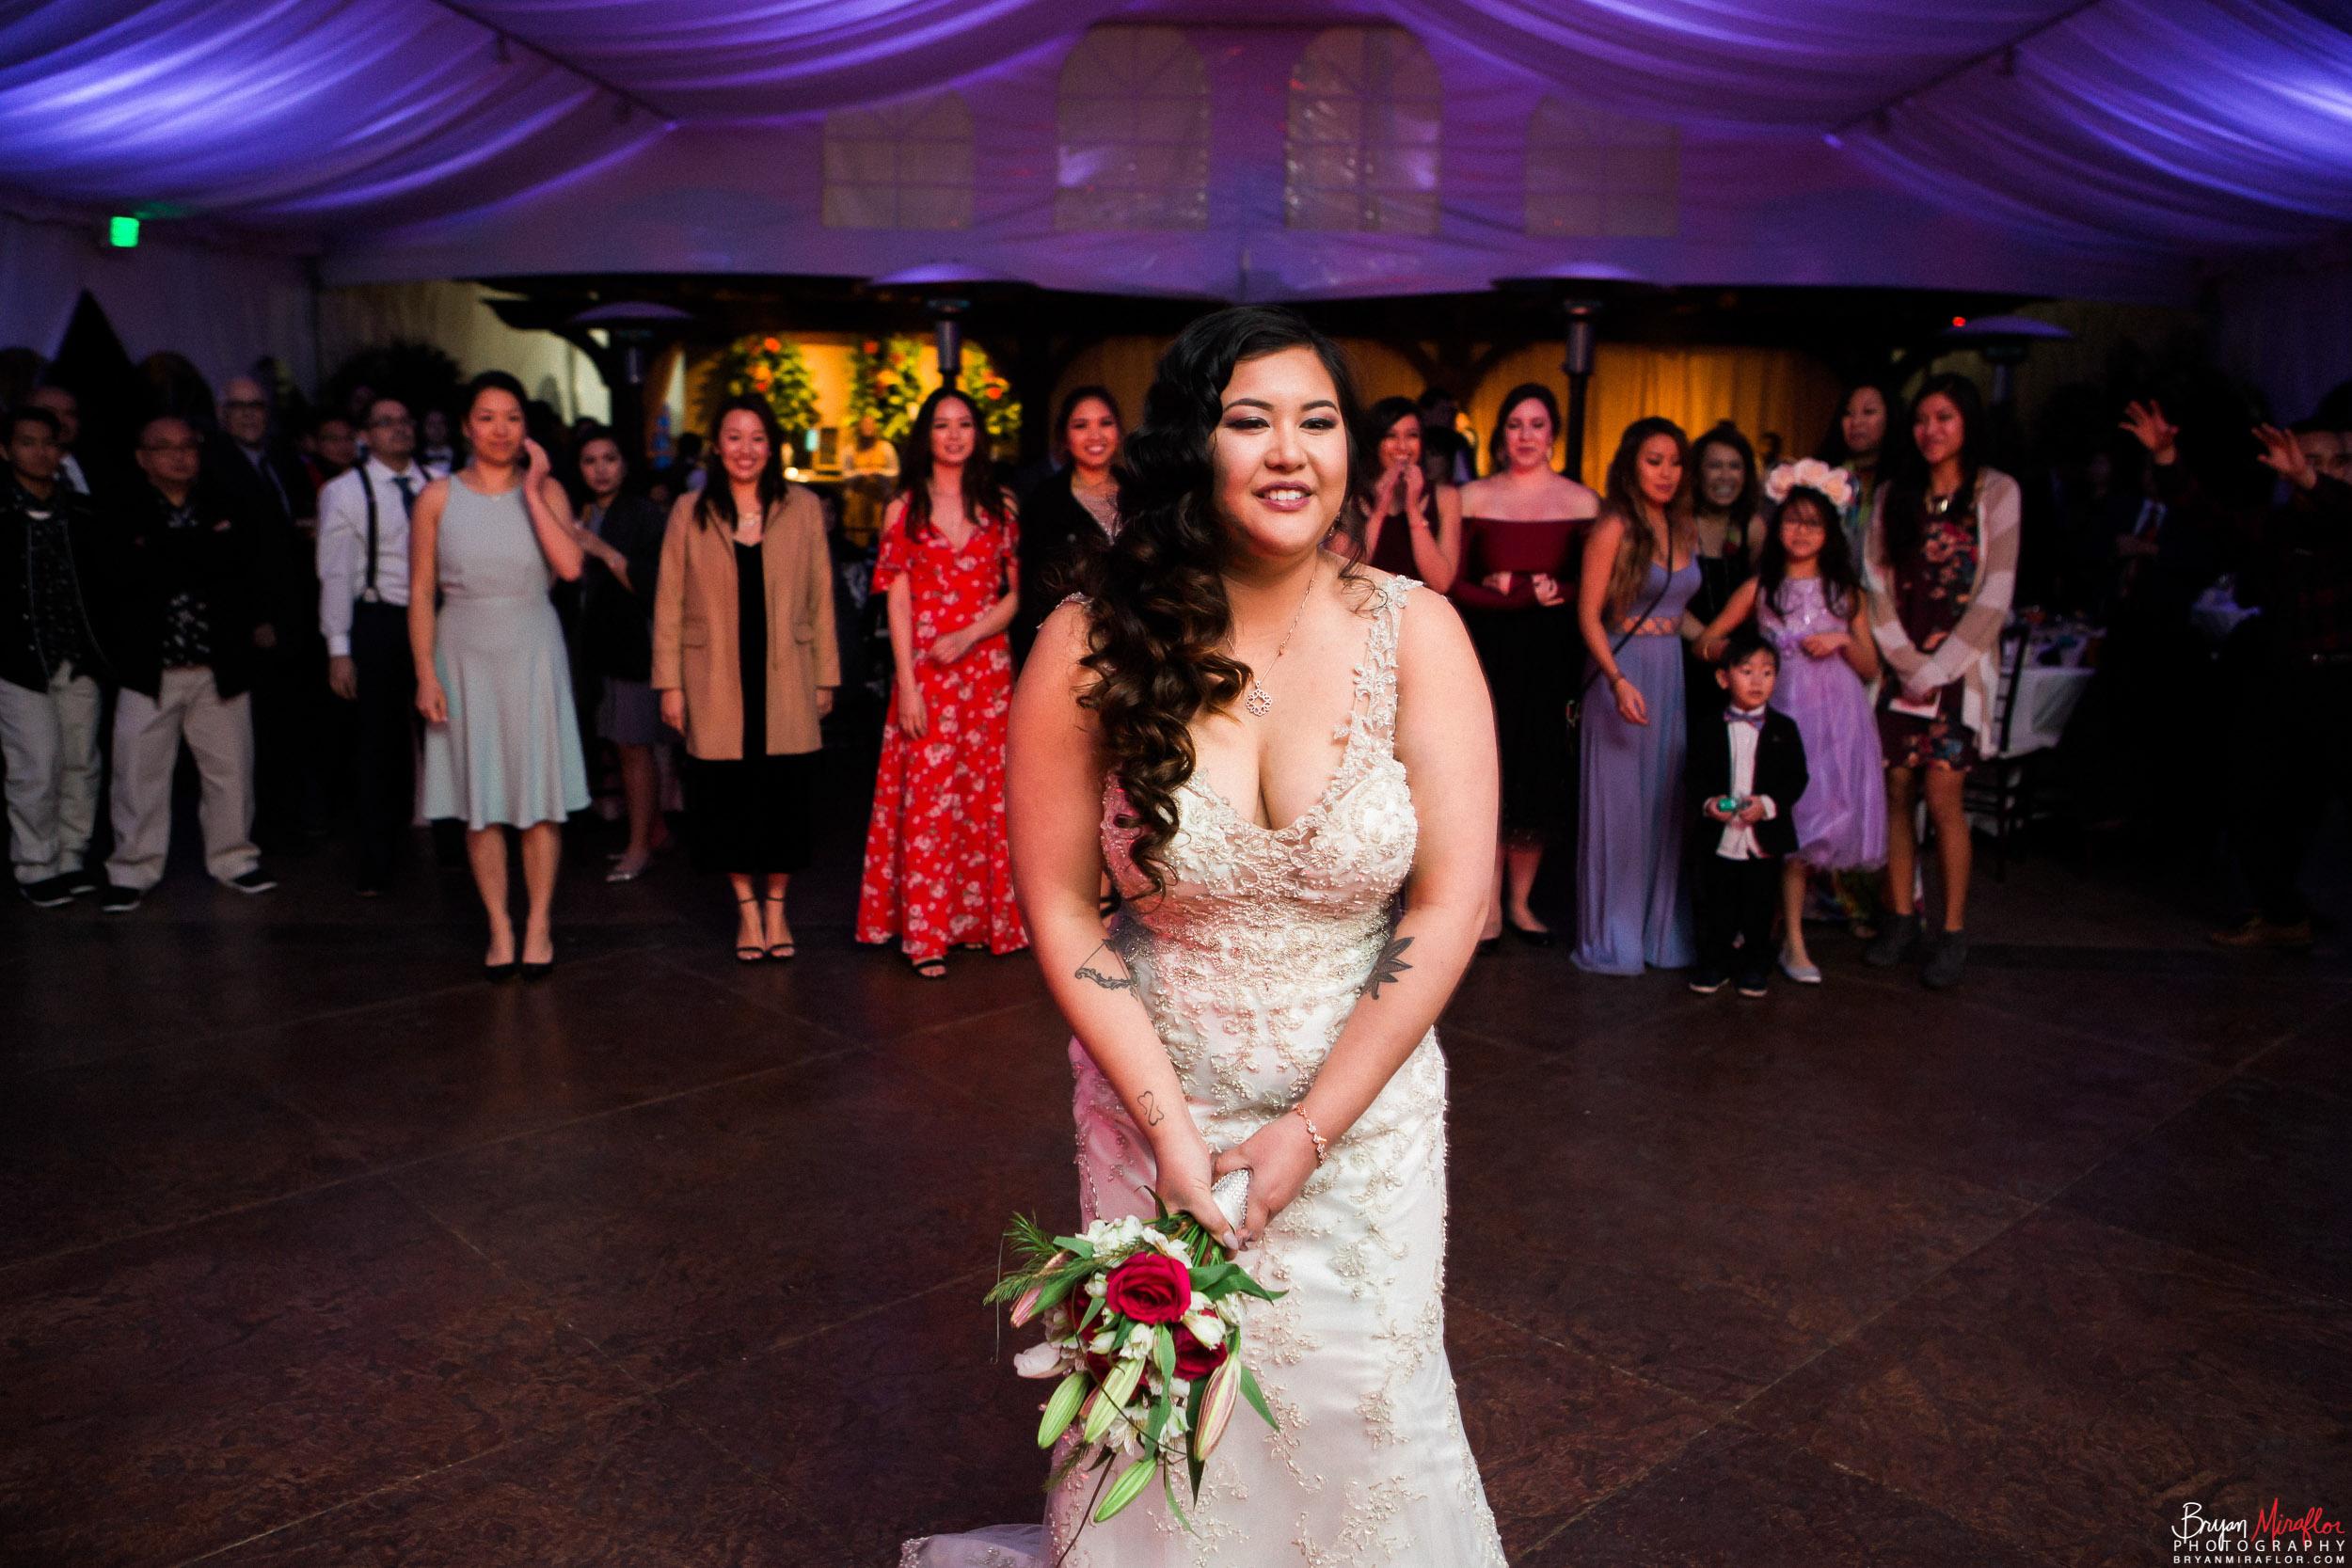 Bryan-Miraflor-Photography-Hannah-Jonathan-Married-Grand-Traditions-Estate-Gardens-Fallbrook-20171222-204.jpg